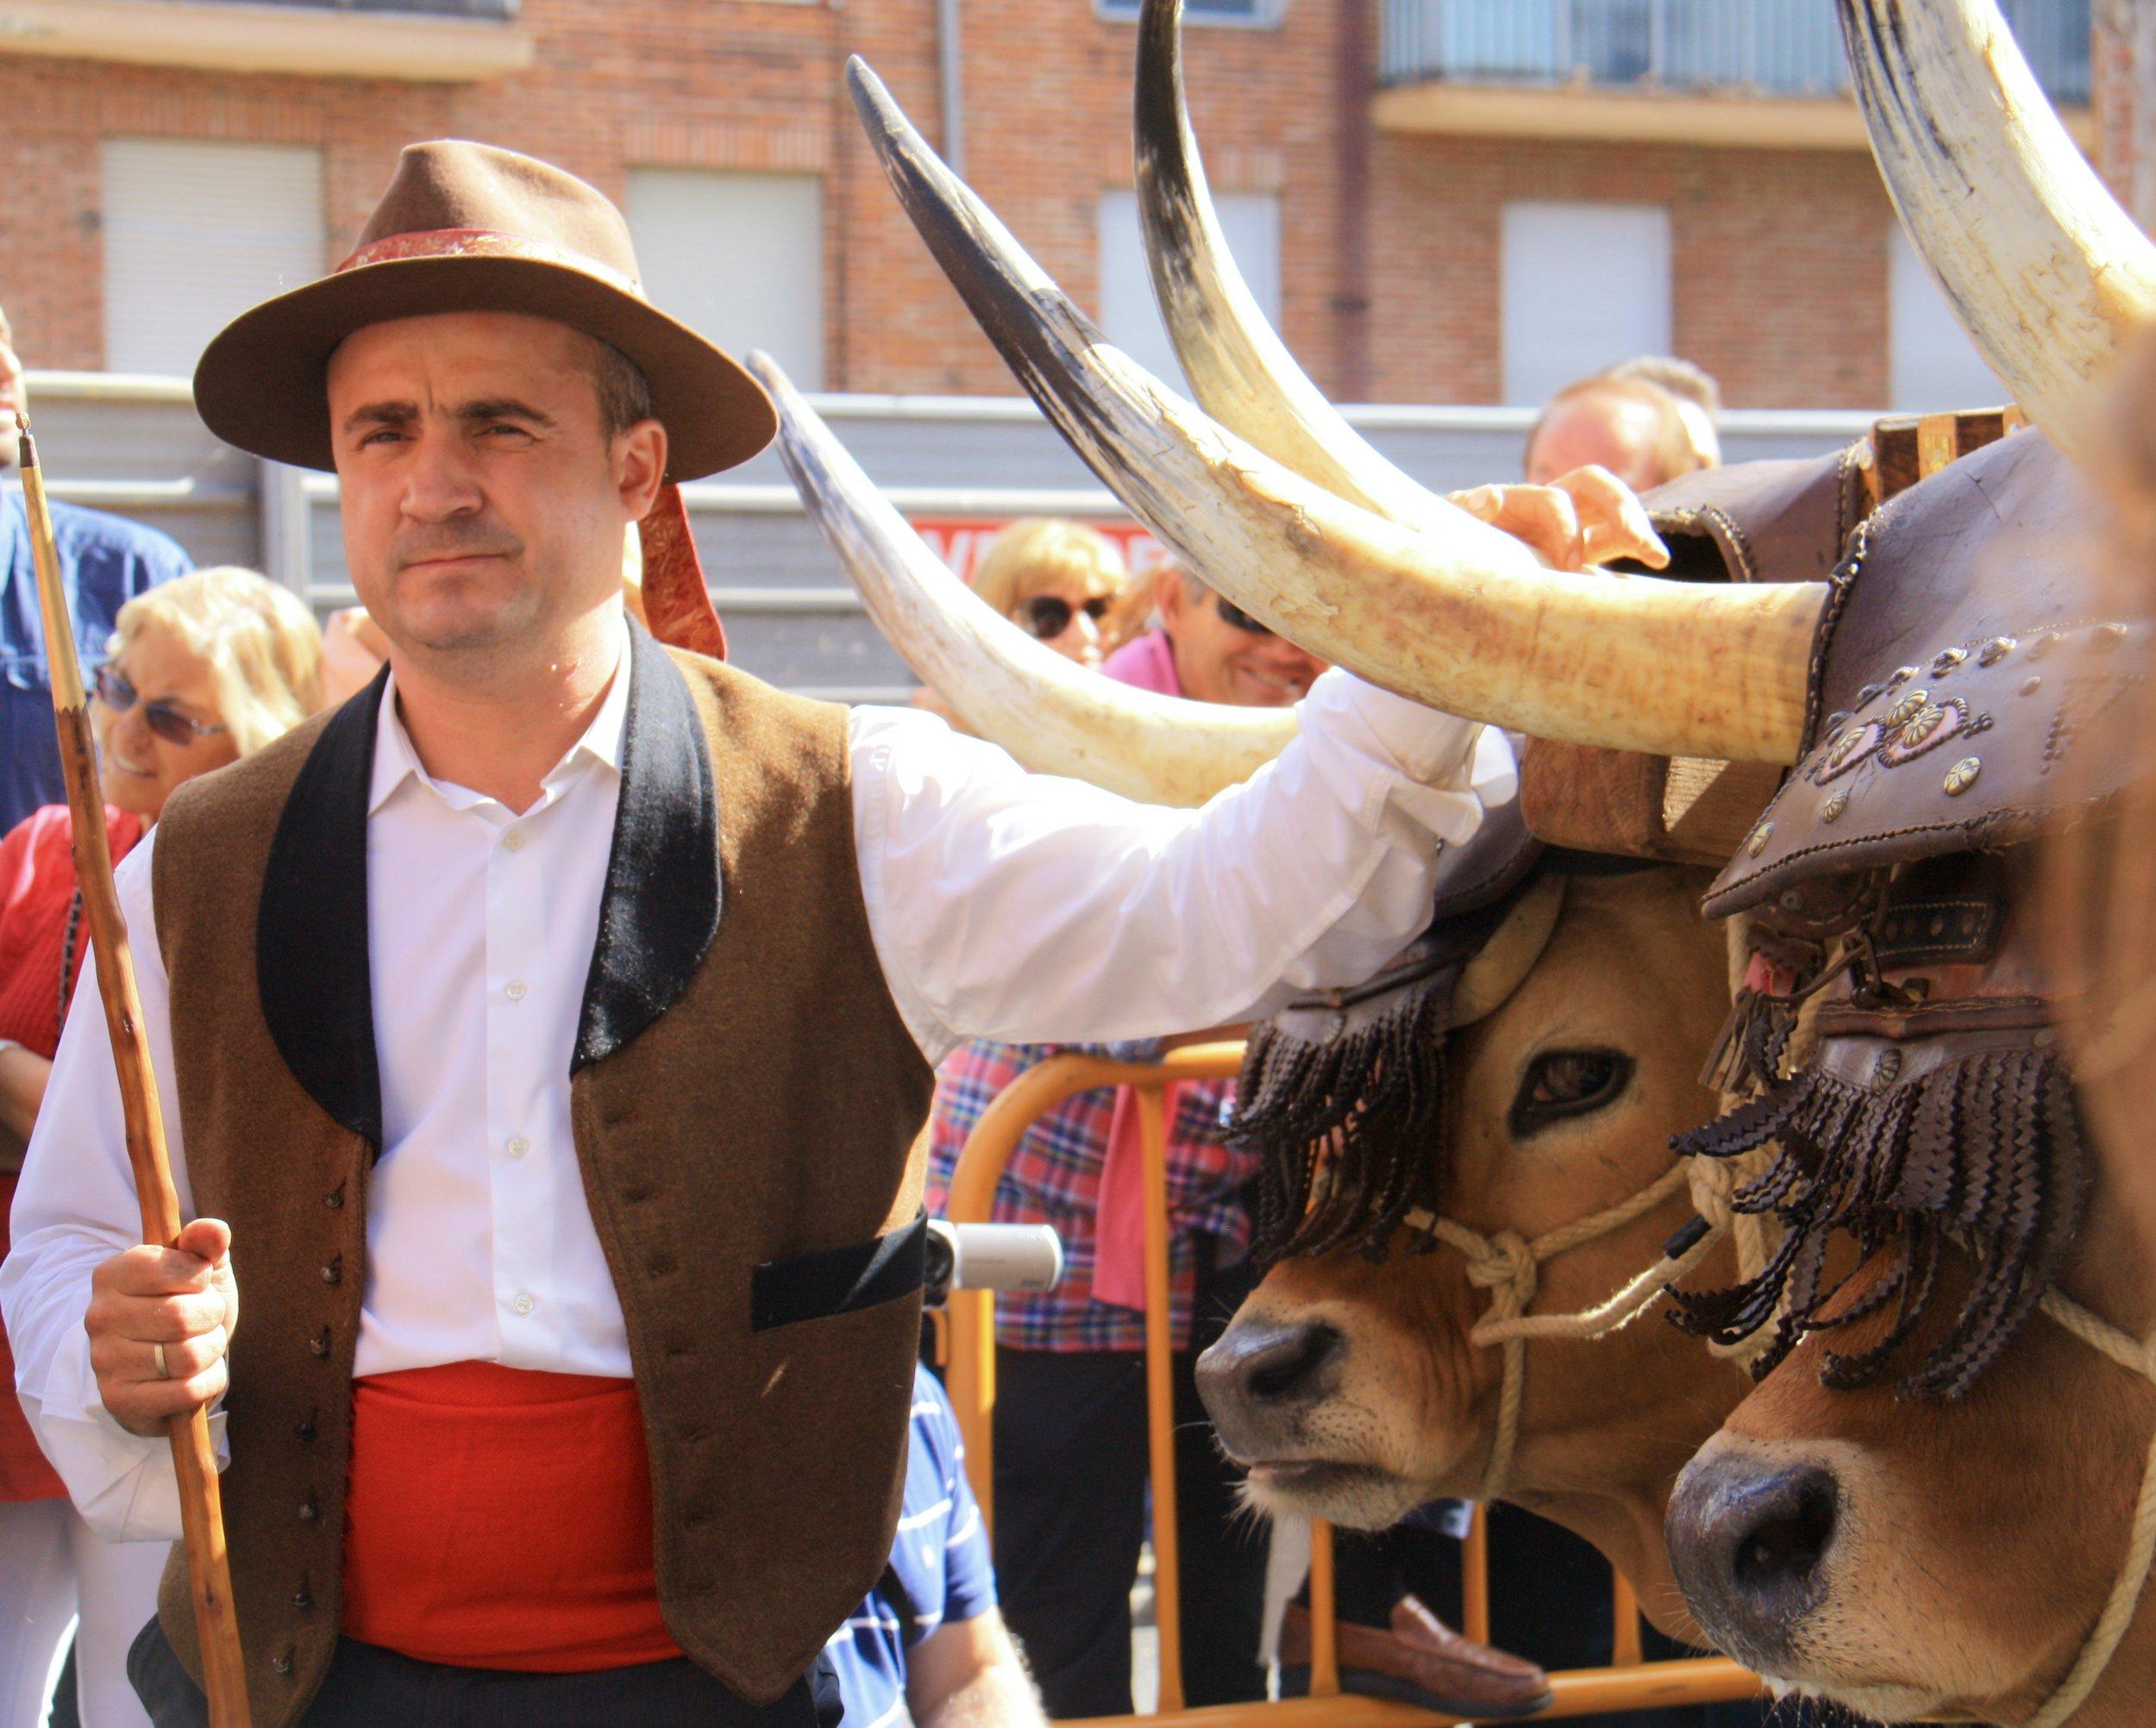 Fiestas throughout the year.